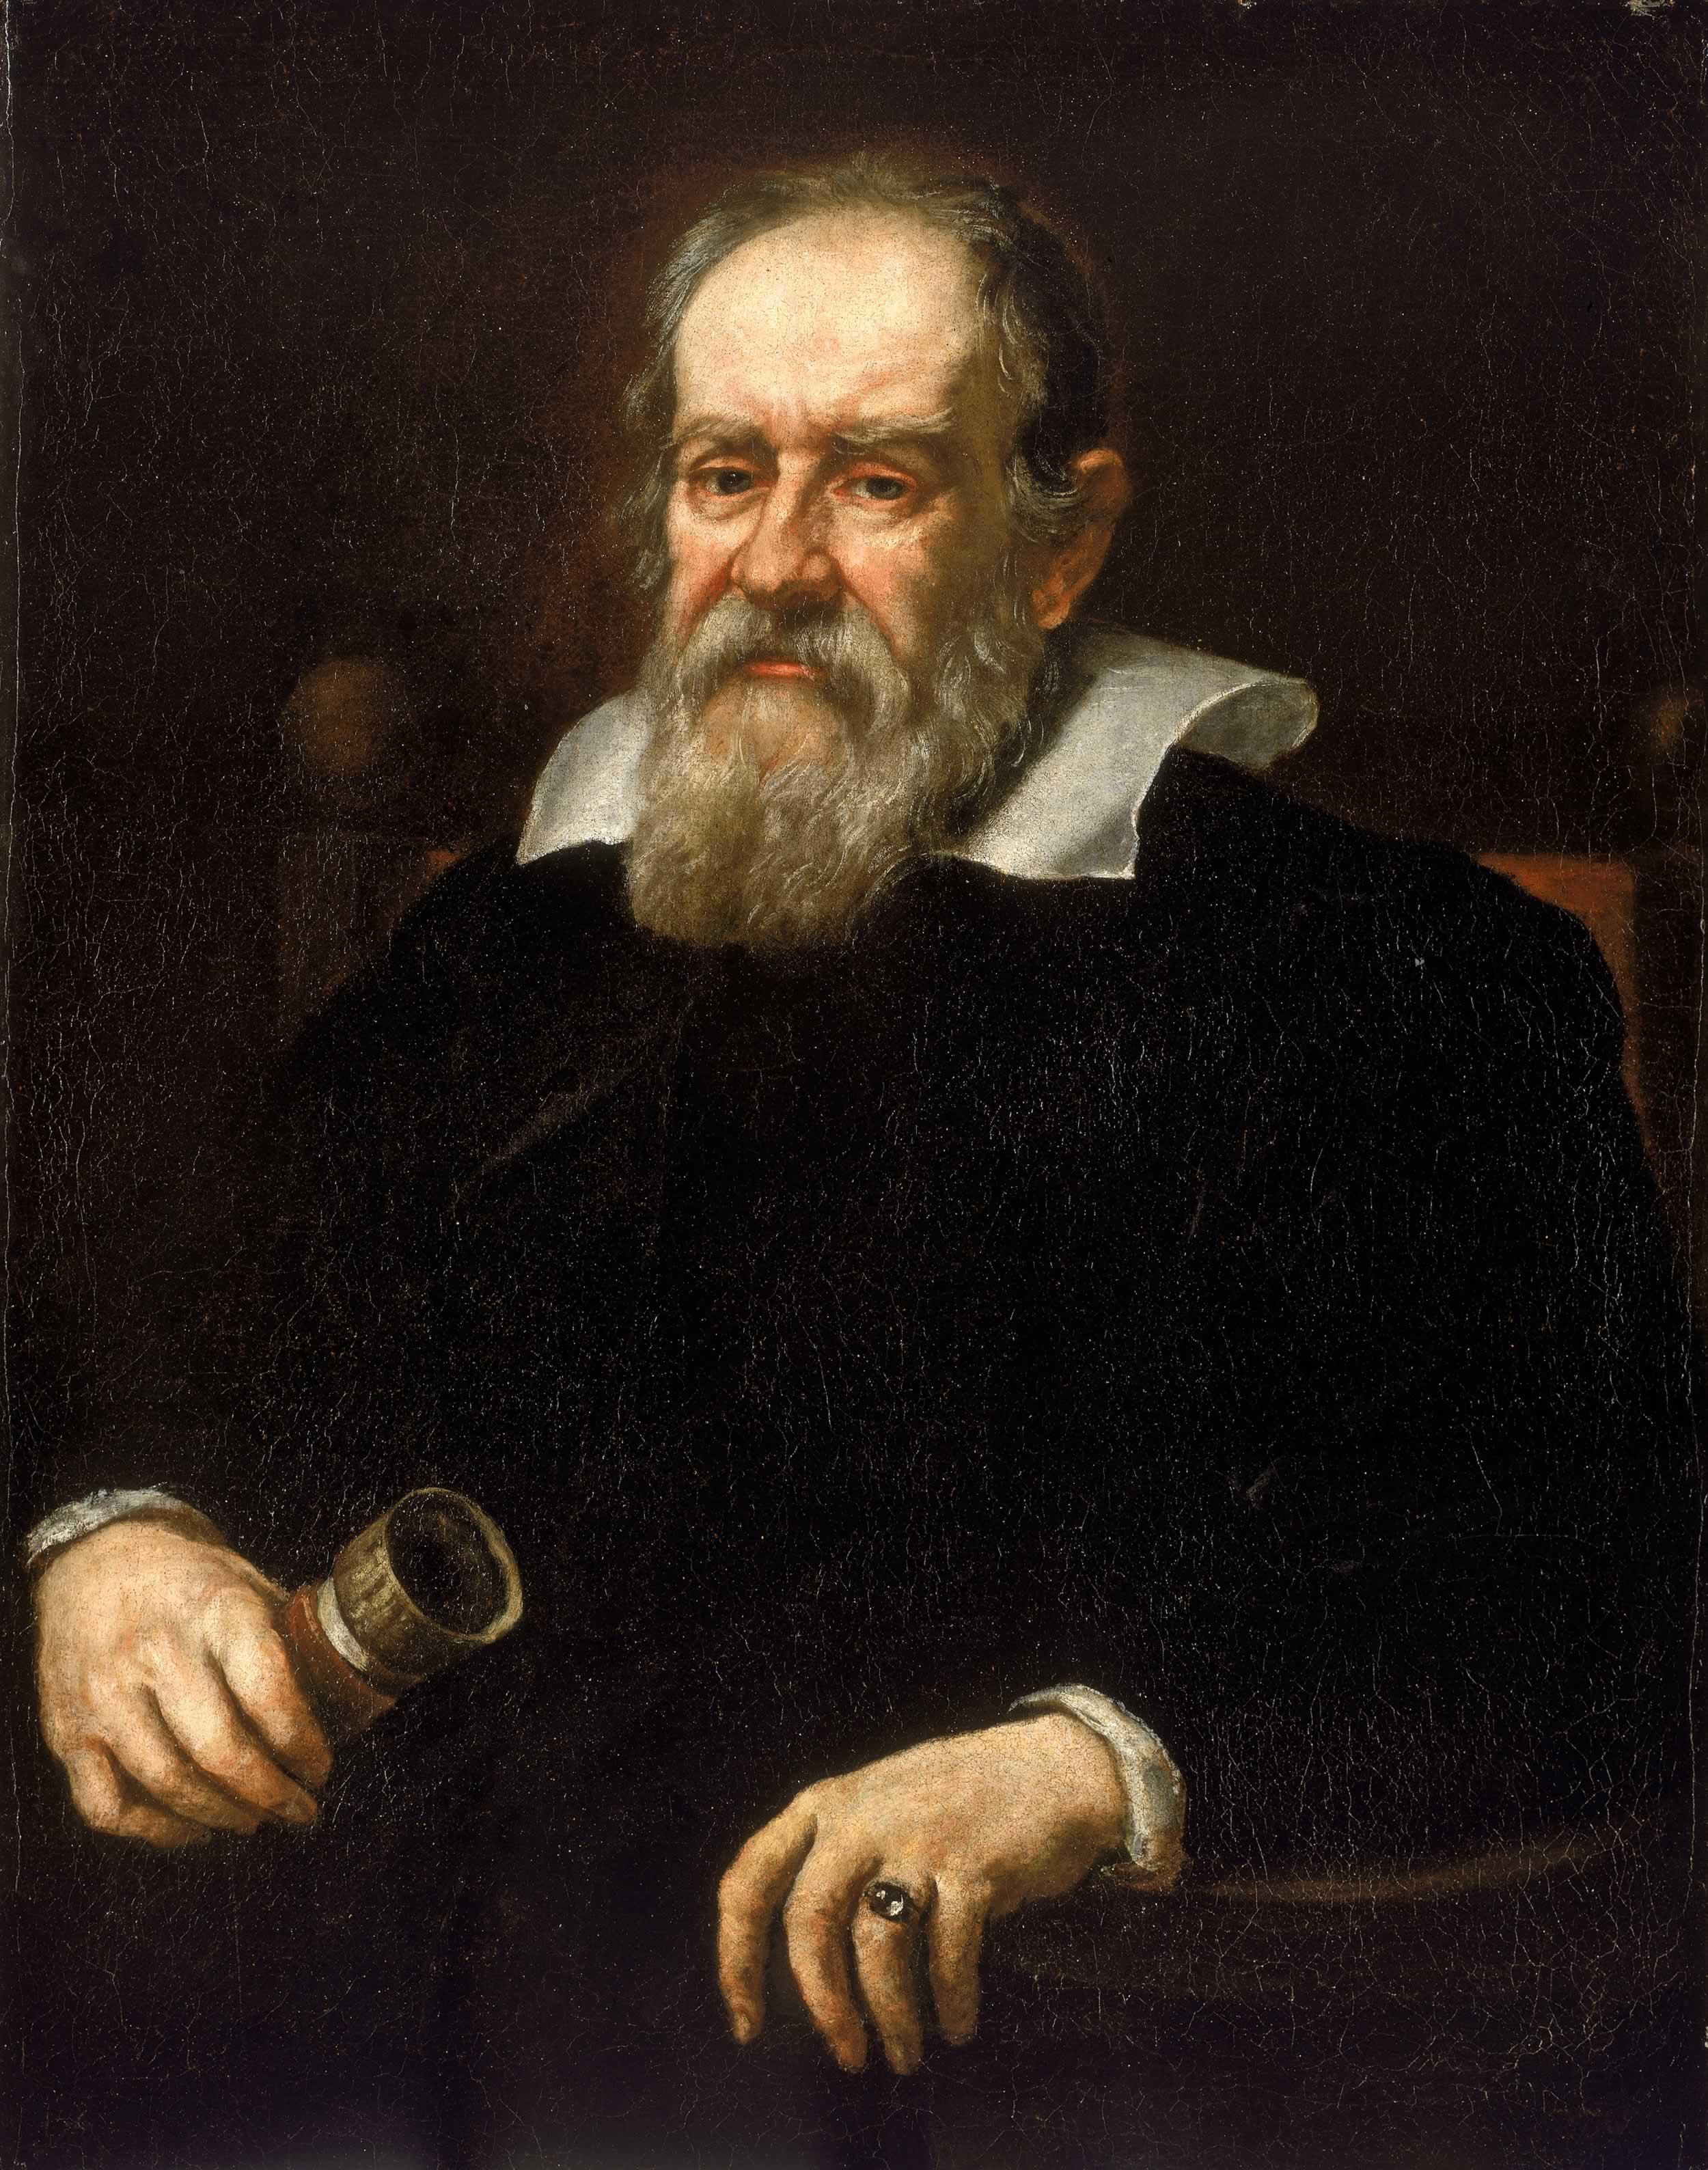 Galileo Galilei - Portrait by Jusus Sustermans (1636)